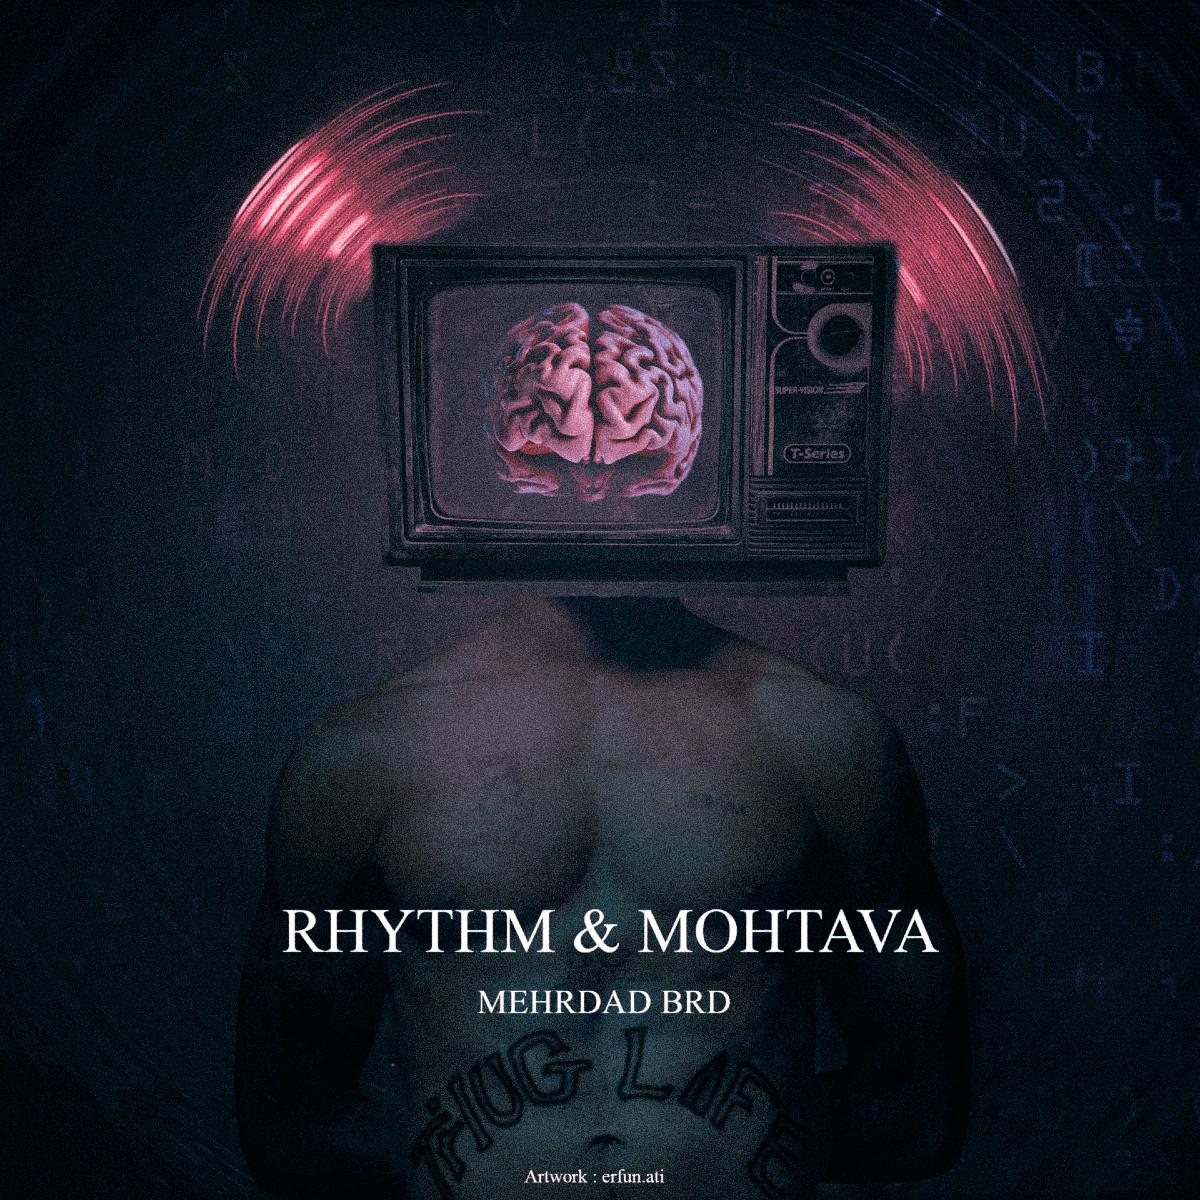 Mehrdad B.R.D - Rhythm & Mohtava Album